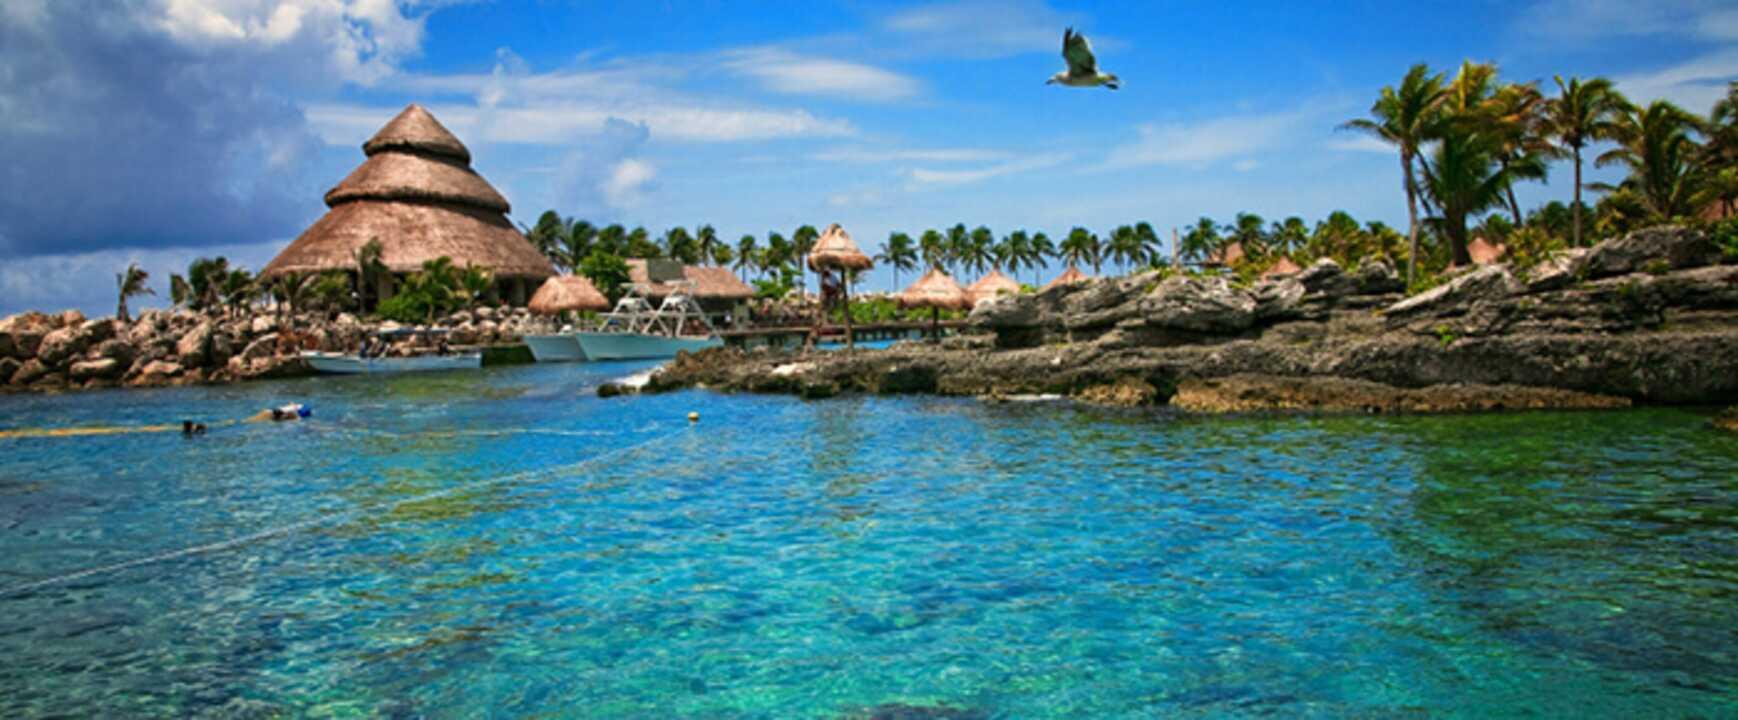 Cheap Holidays To Riviera Maya On The Beach